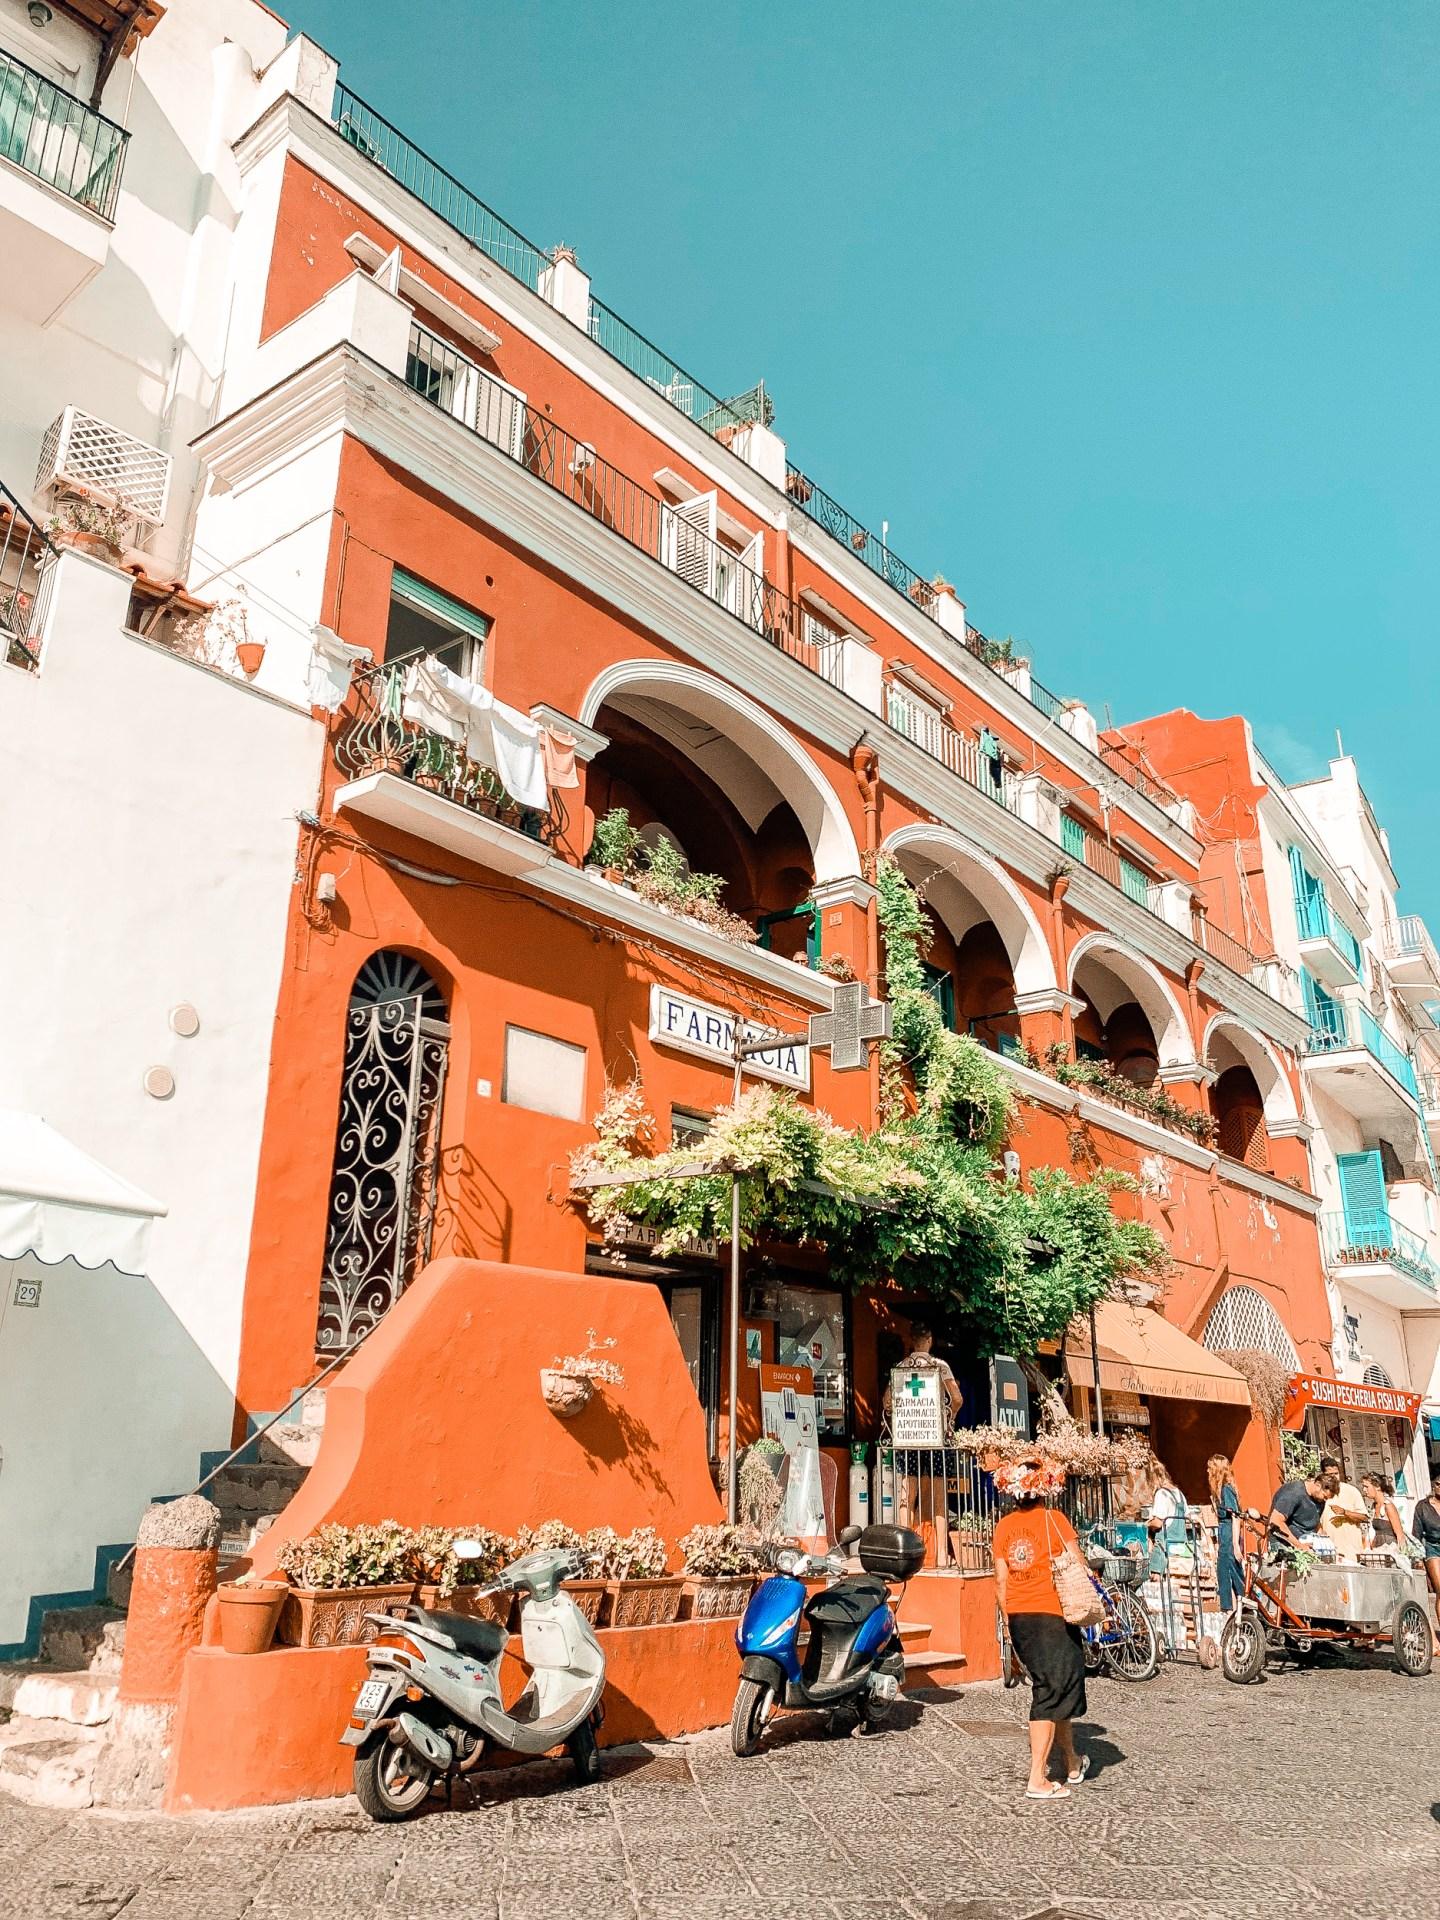 Flaneren in het chique Capri (Napels & Amalfi travel guide 6/7)